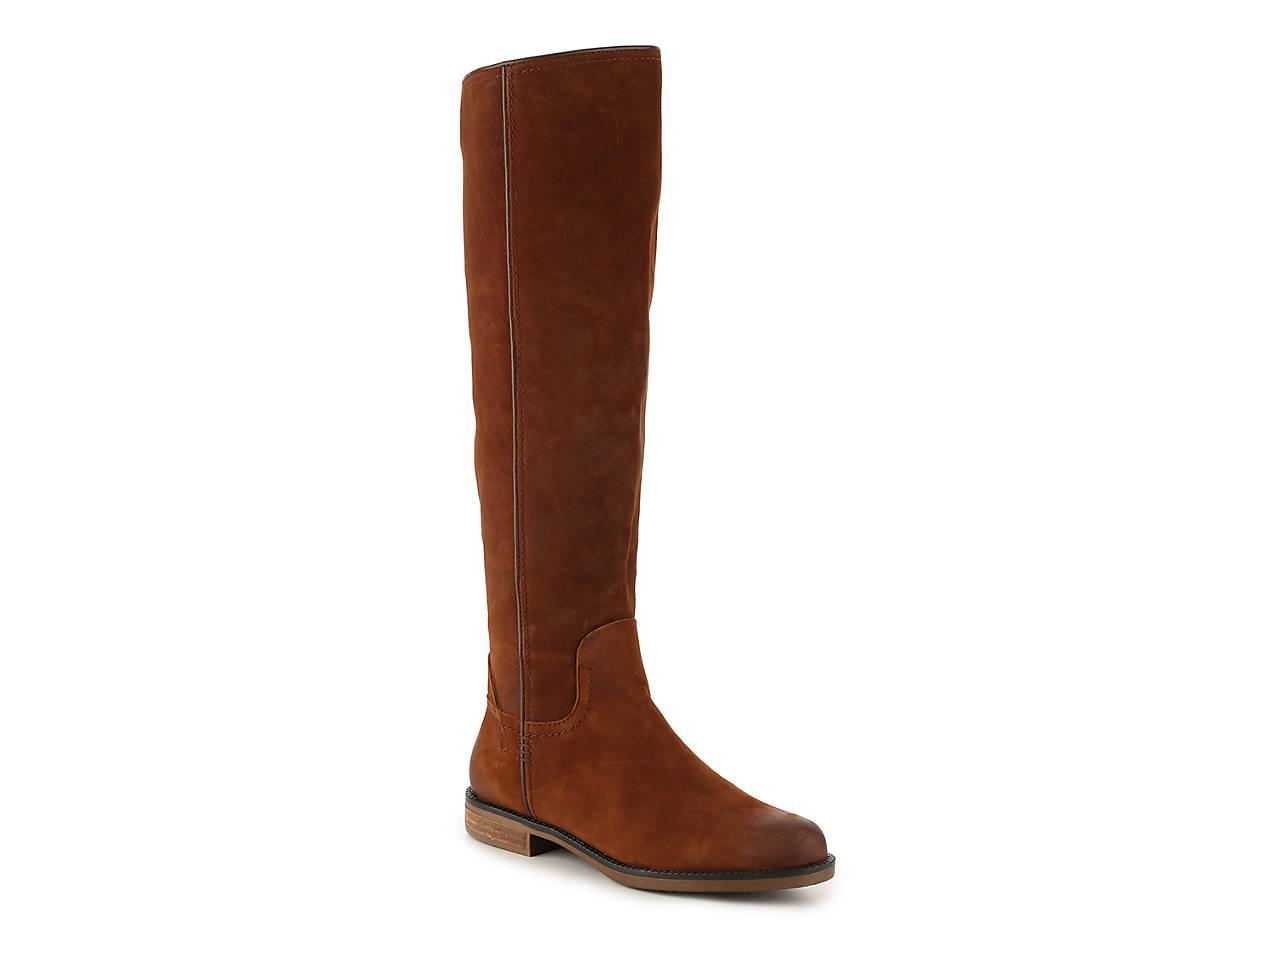 f5e14dcaa500 Franco Sarto Chandra Wide Calf Riding Boot Women s Shoes